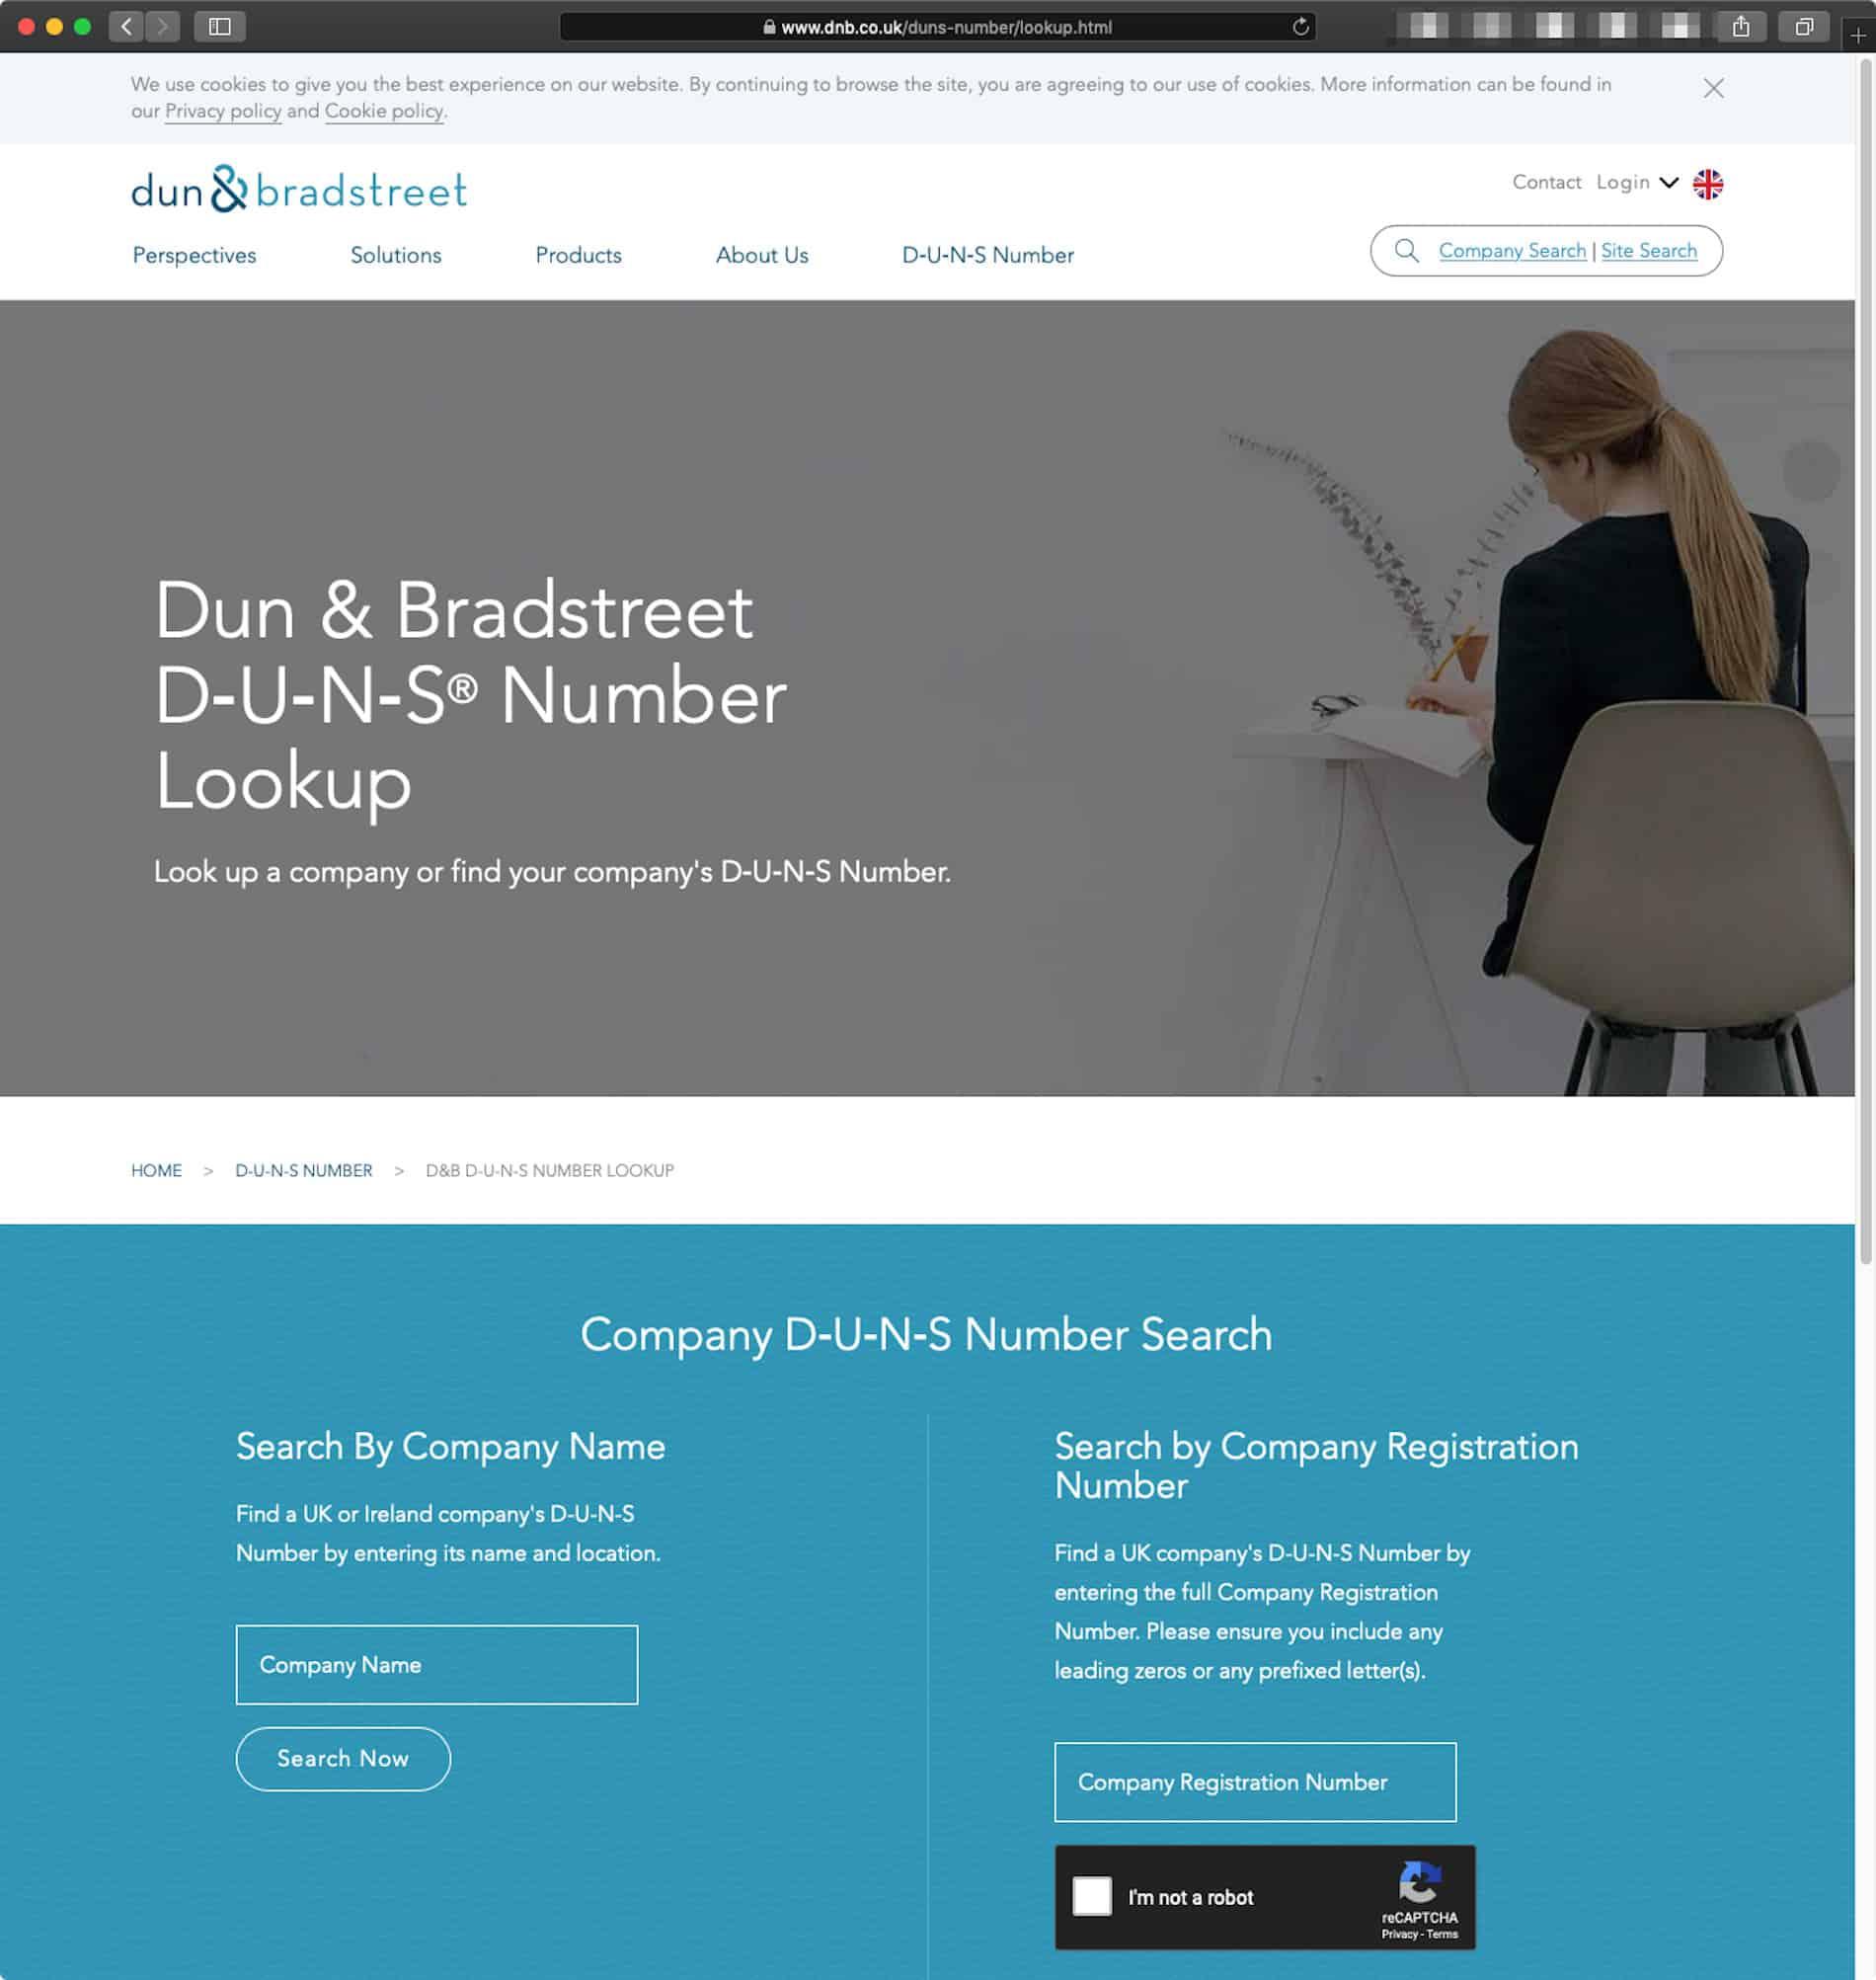 A Screenshot of the Dun & Bradstreet UK Platform